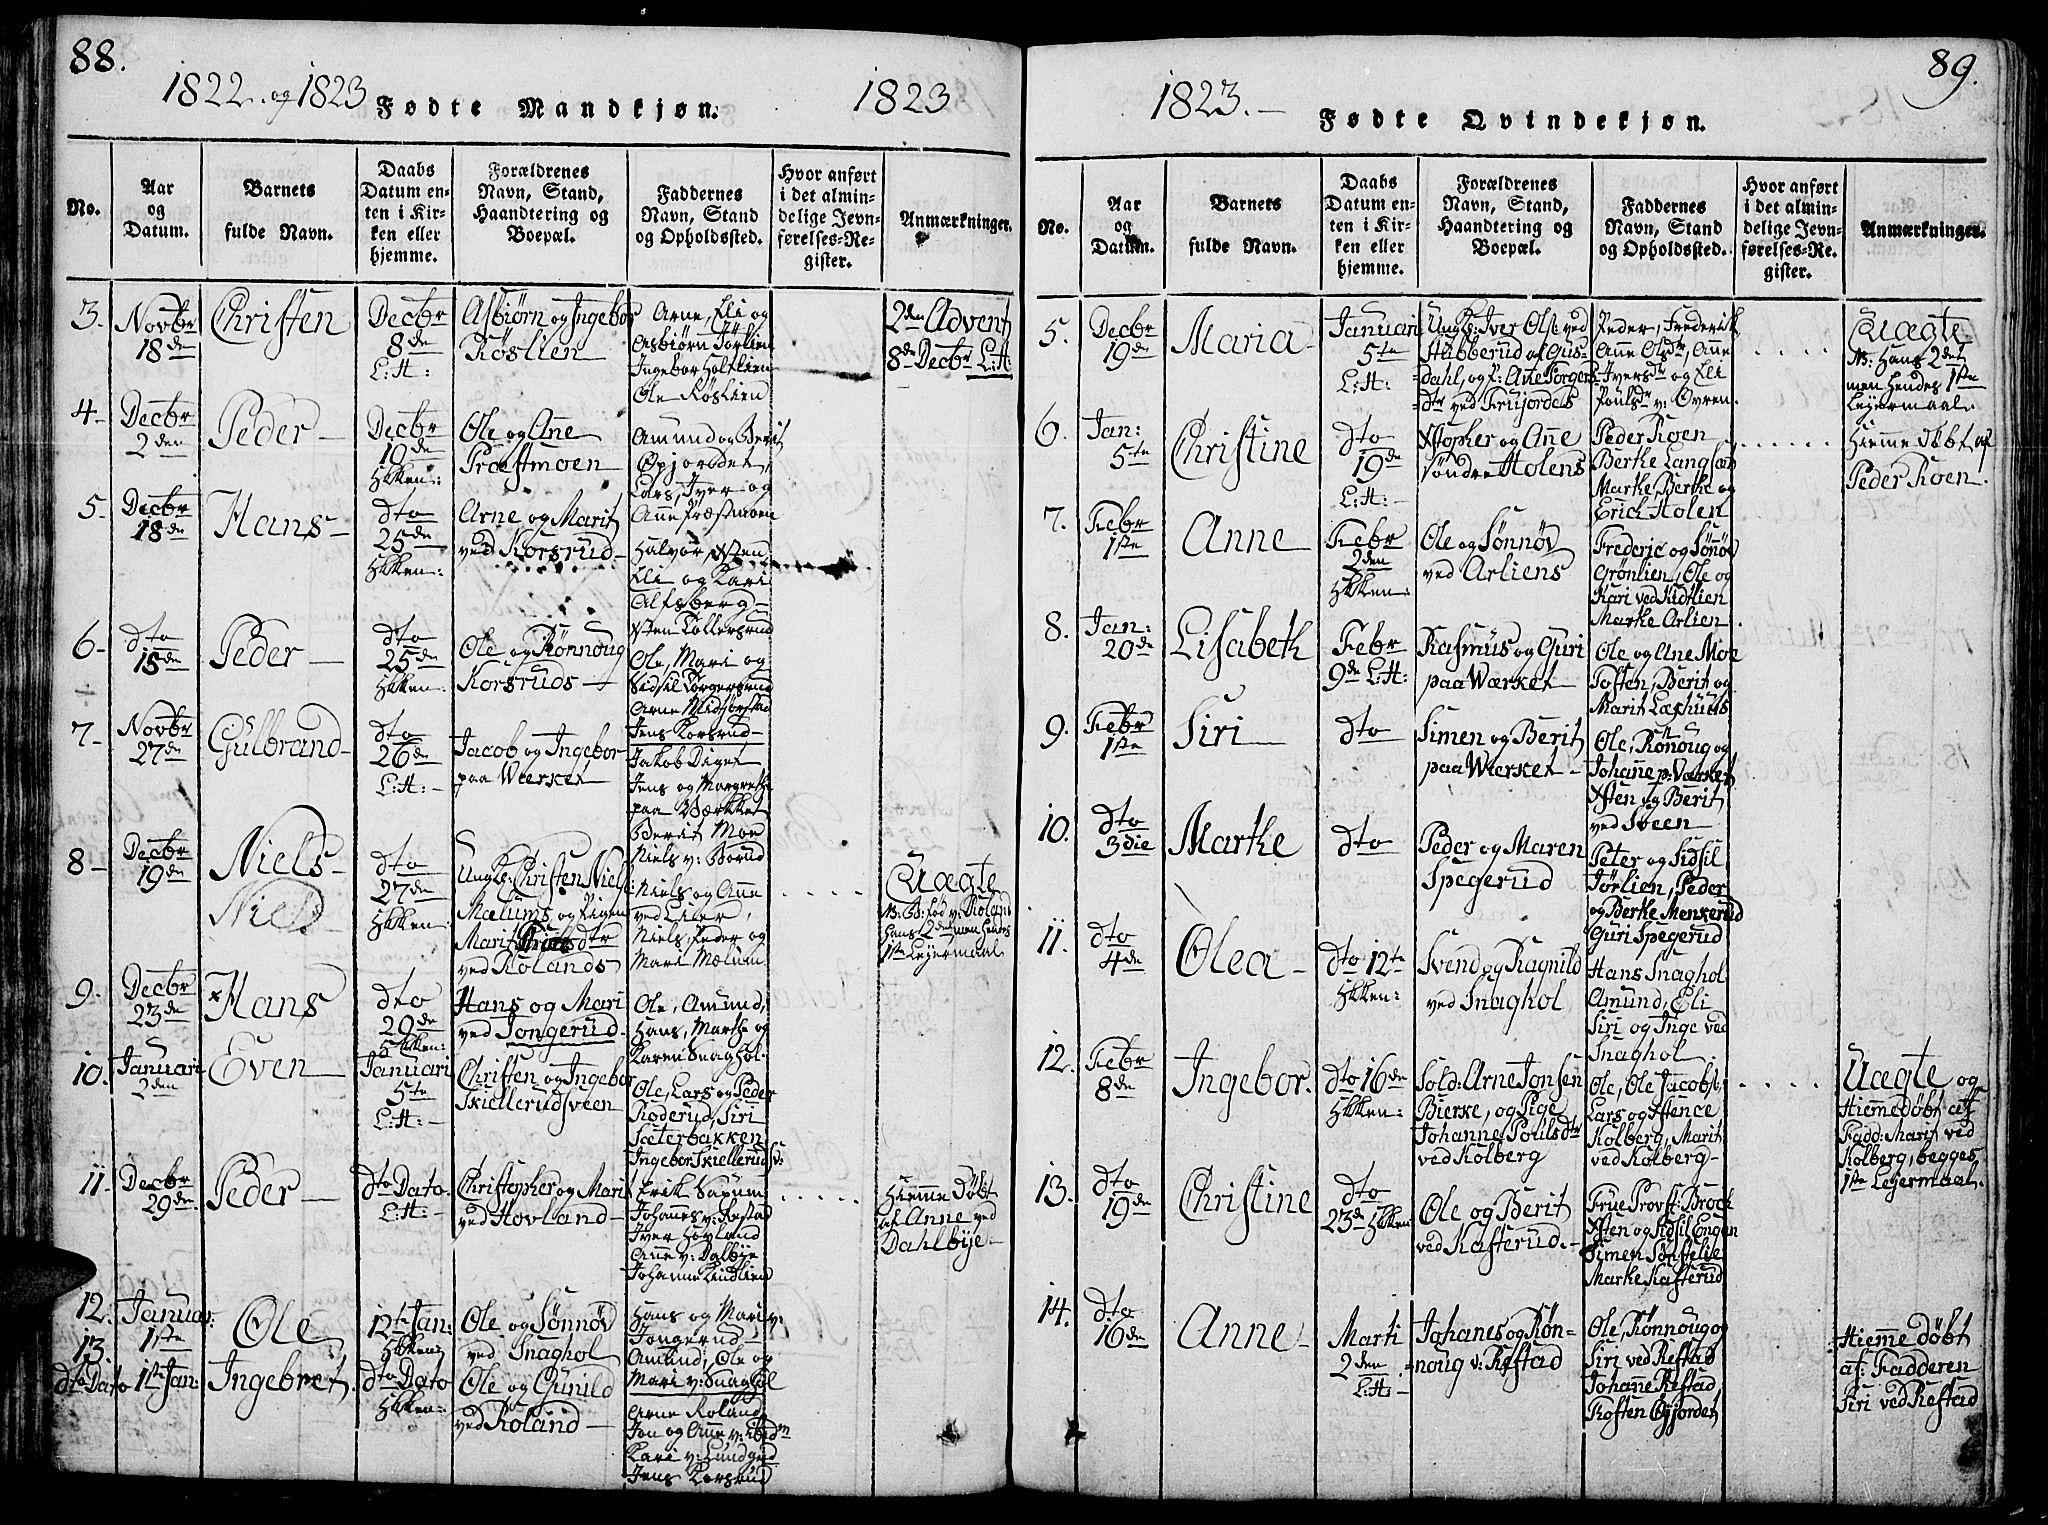 SAH, Fåberg prestekontor, Klokkerbok nr. 4, 1818-1837, s. 88-89